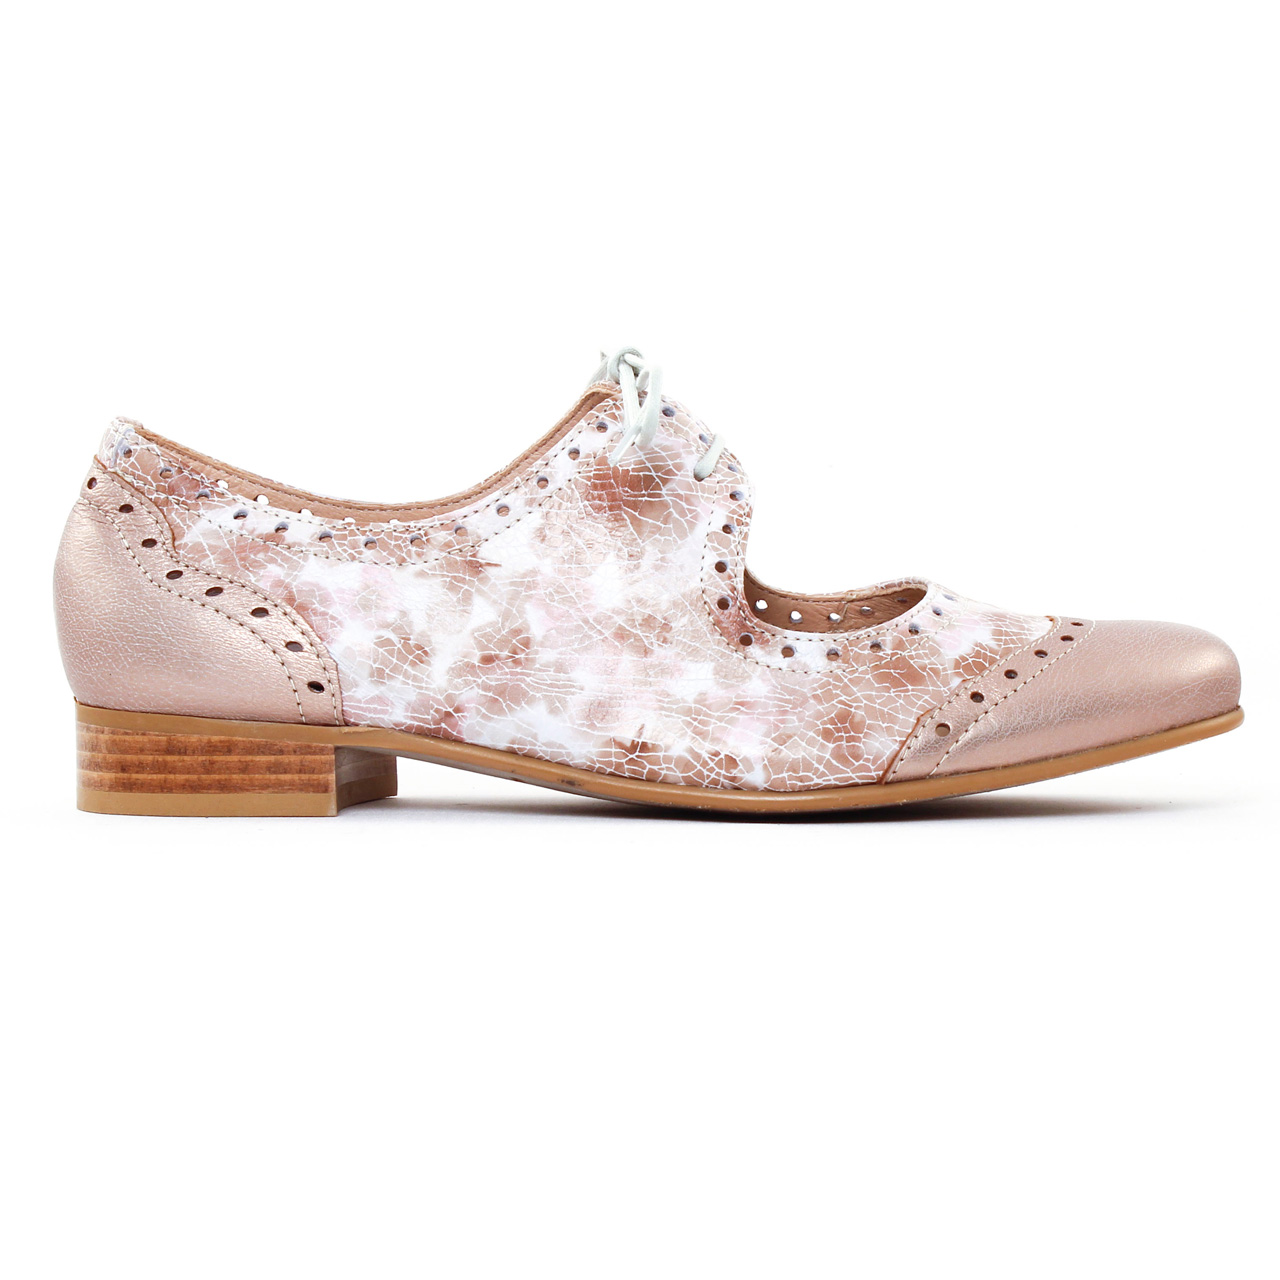 Chaussures à lacets COSTA COSTA cuir blanc 38 fODZFR5y